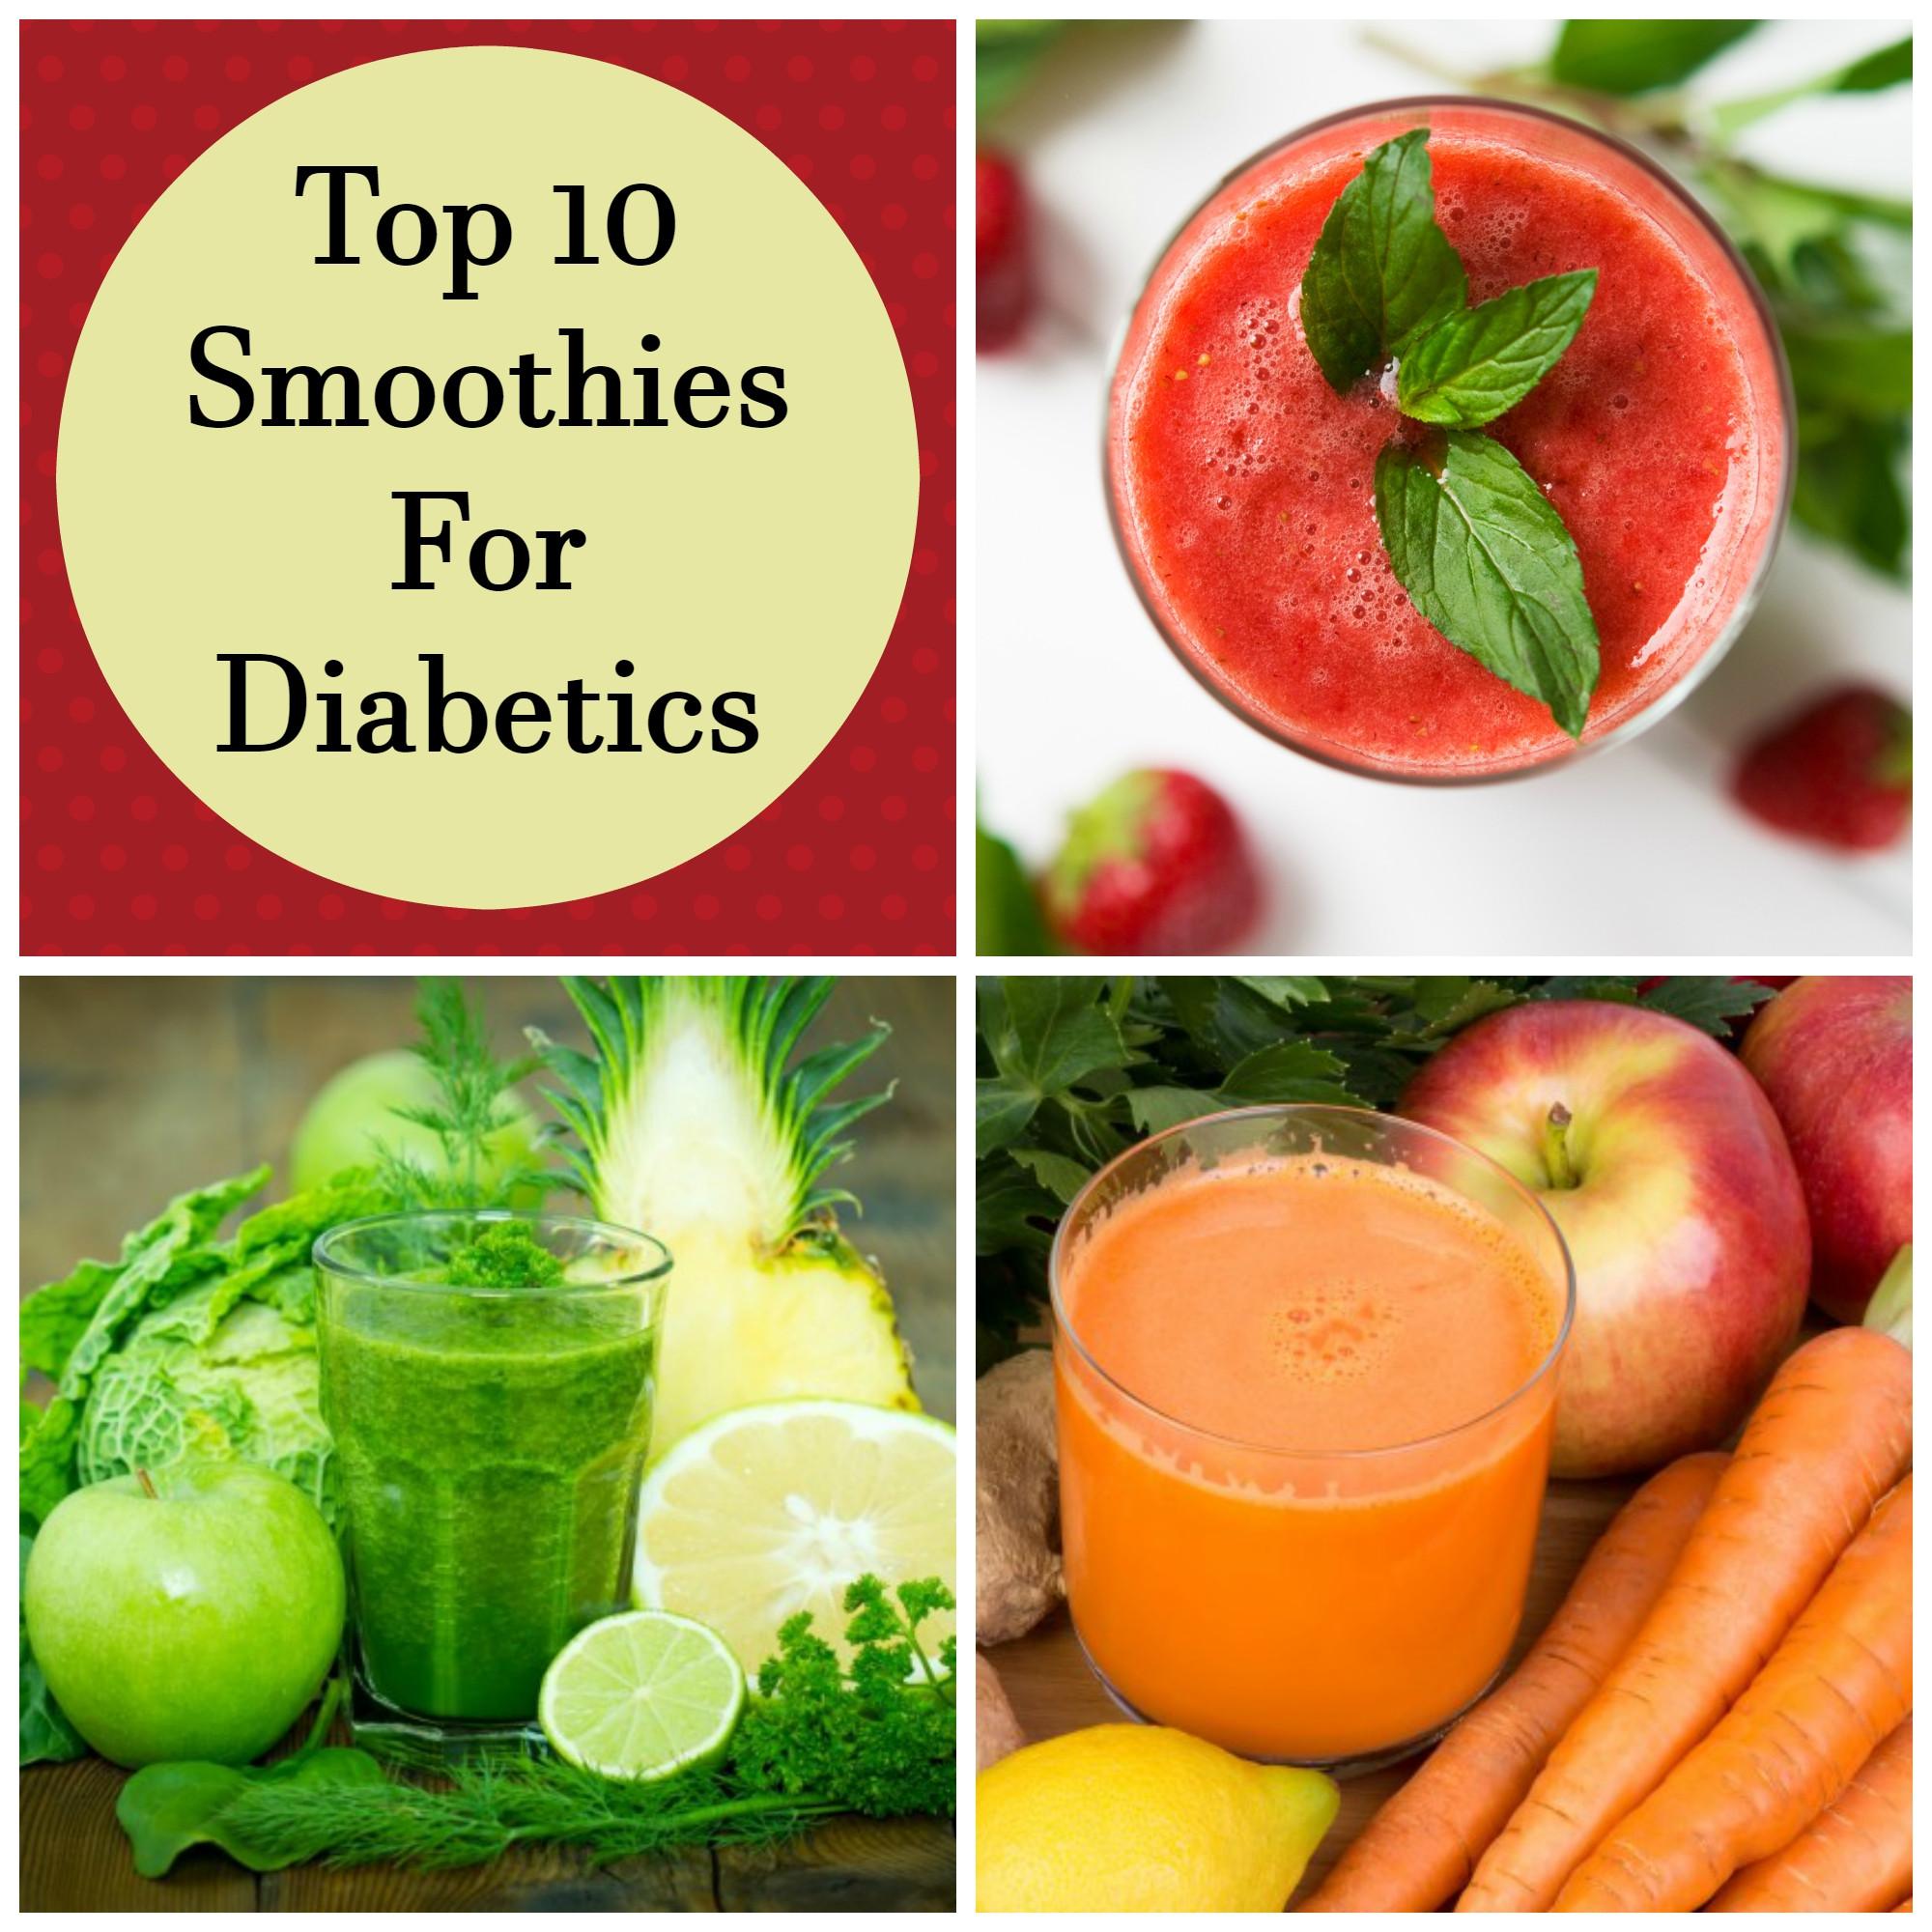 Smoothies For Diabetics  10 Delicious Smoothies for Diabetics All Nutribullet Recipes